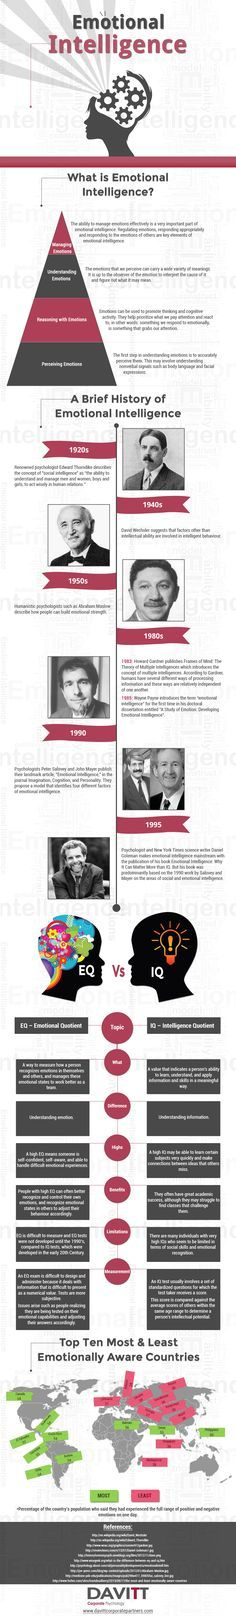 Emotional Intelligence #Infographic #Emotion #Intelligence REALLY cool to visualize like this....